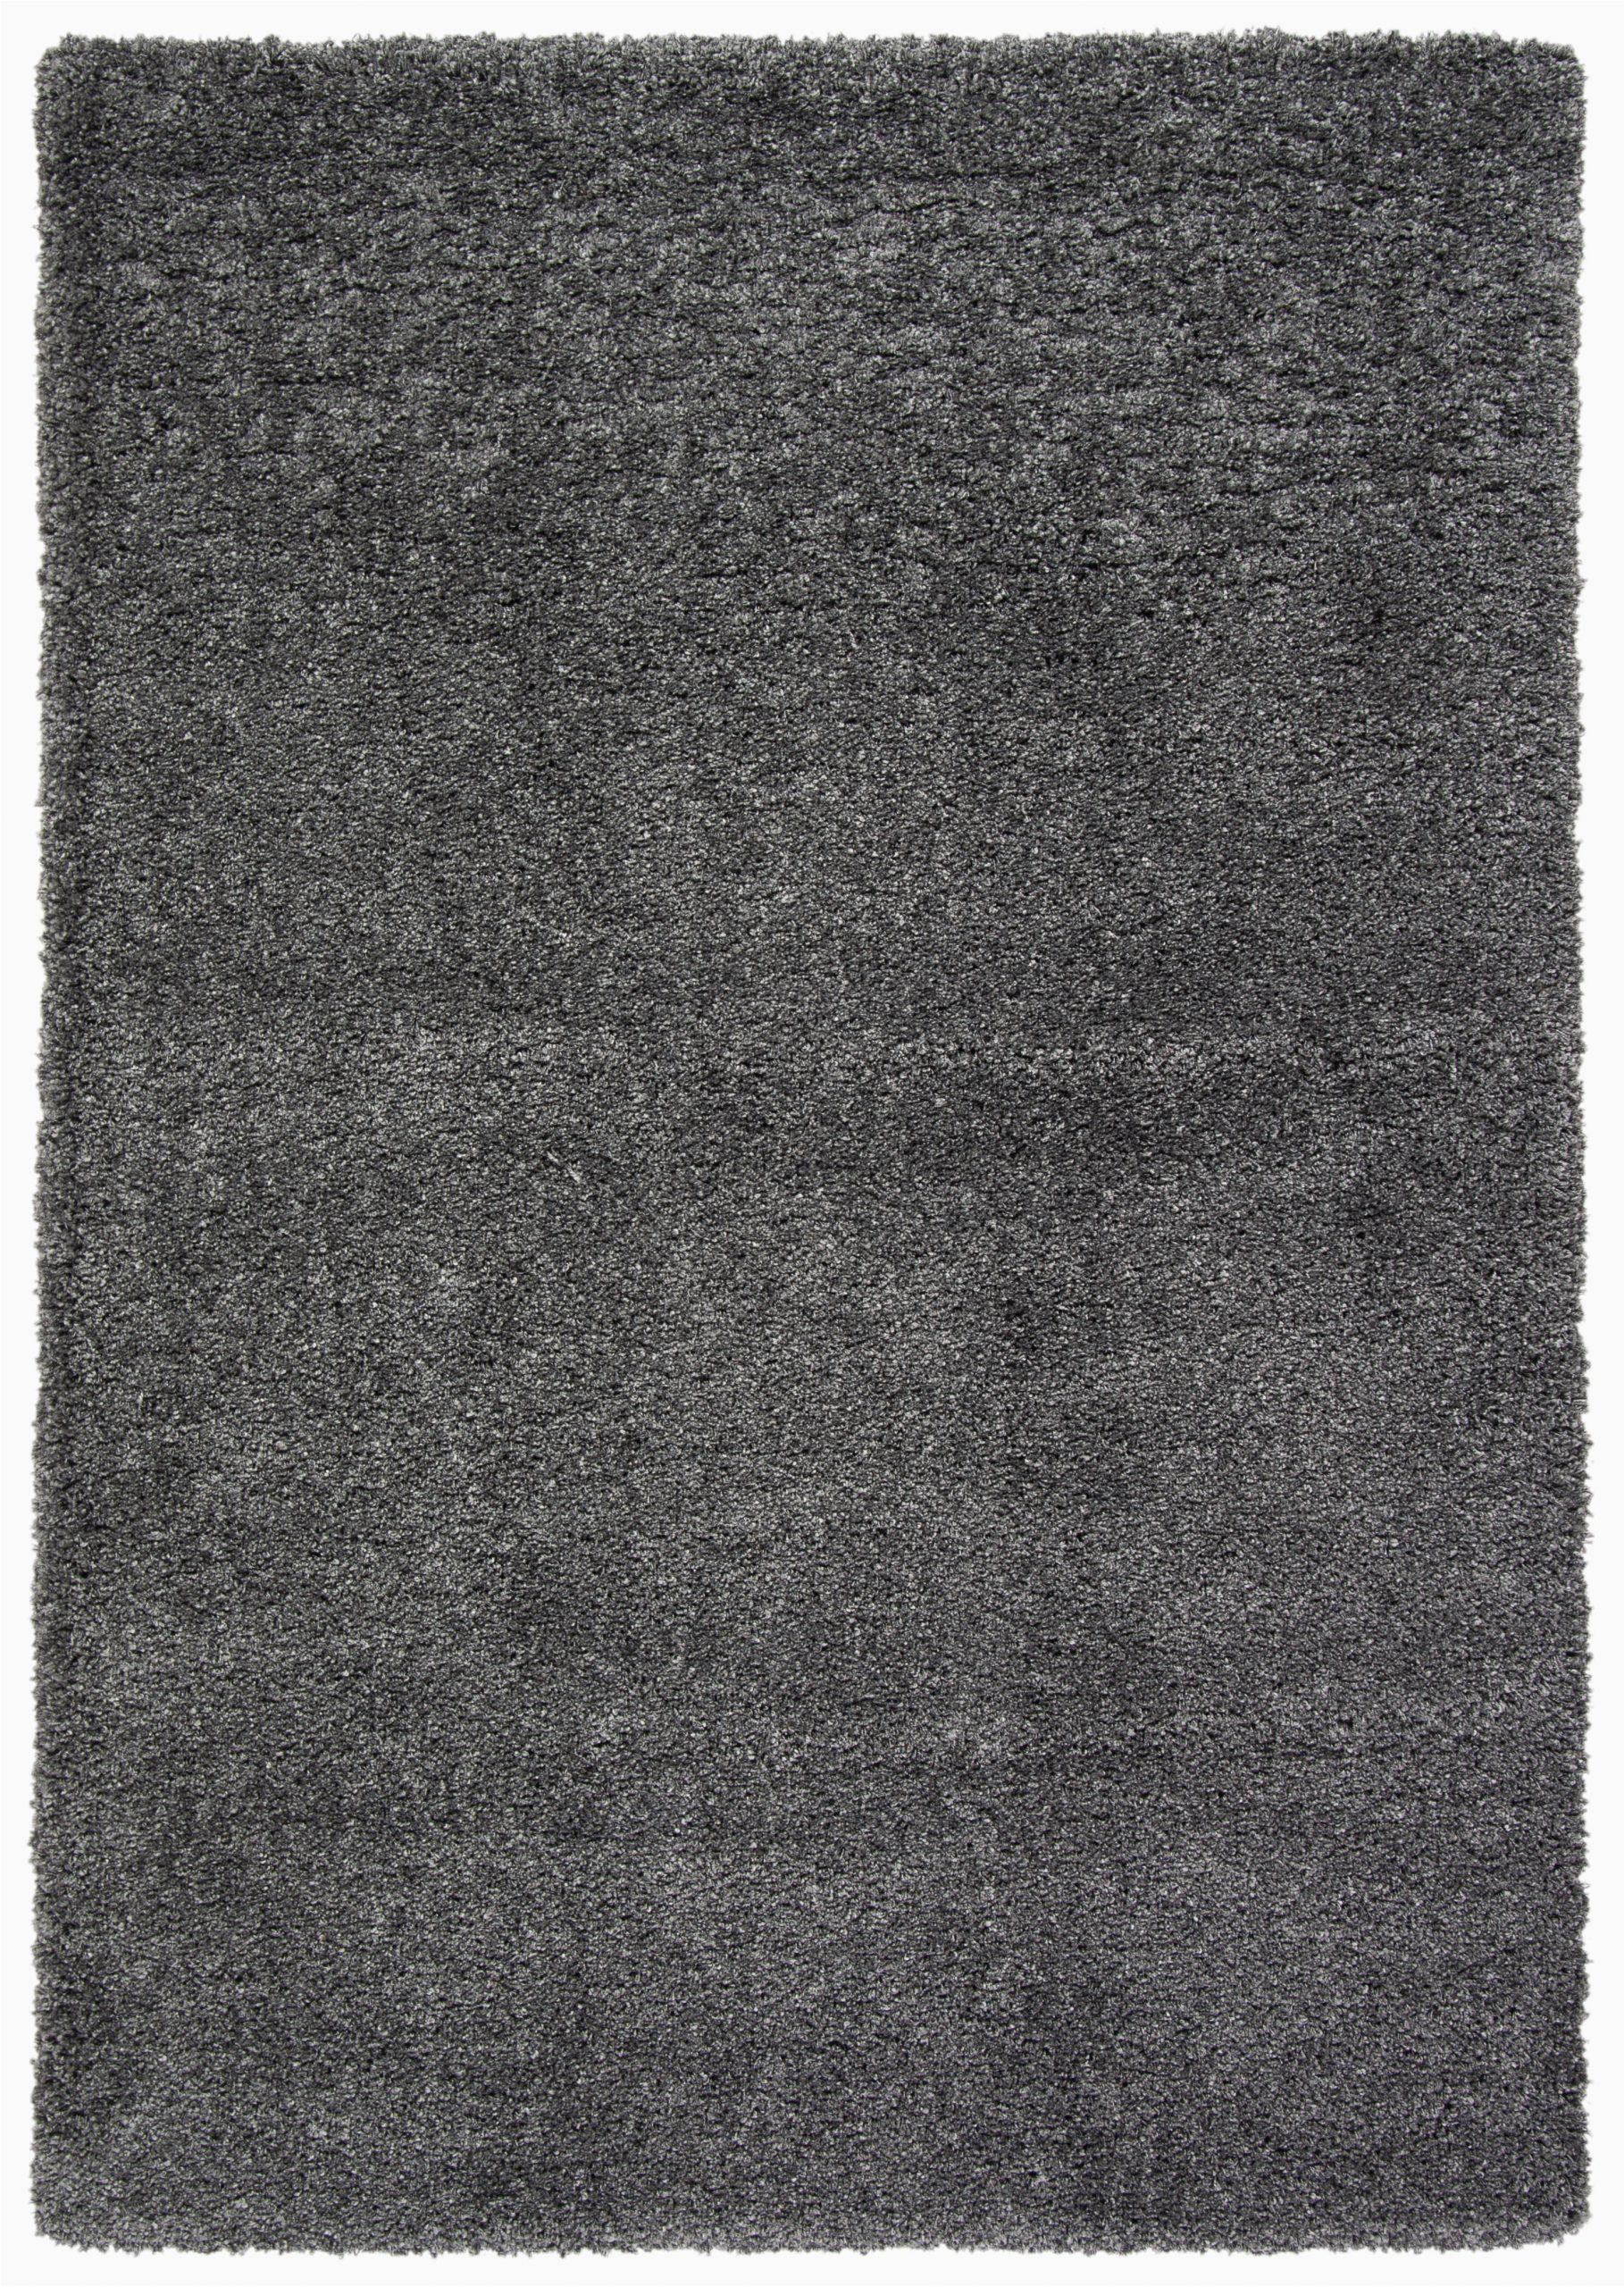 Dark Gray and White area Rug Eunice Dark Gray area Rug